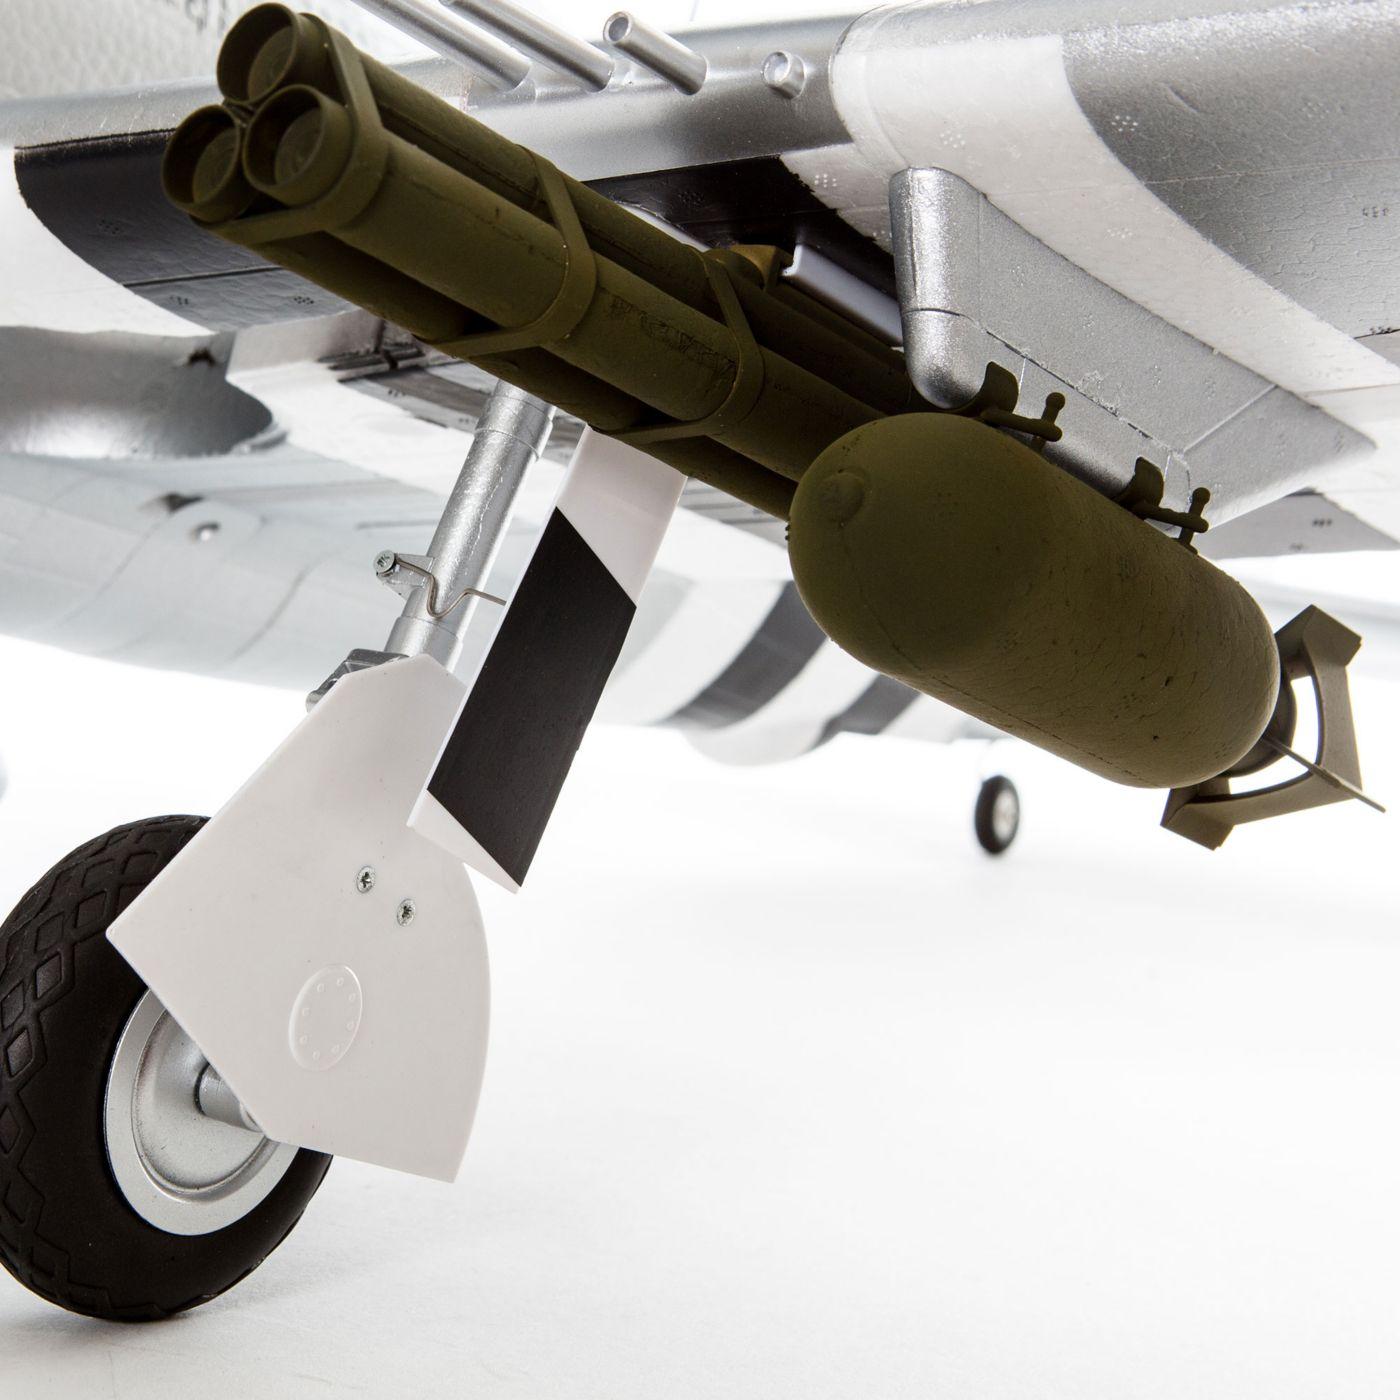 E-flite P-47 Razorback Warbird bnf basic safe 06